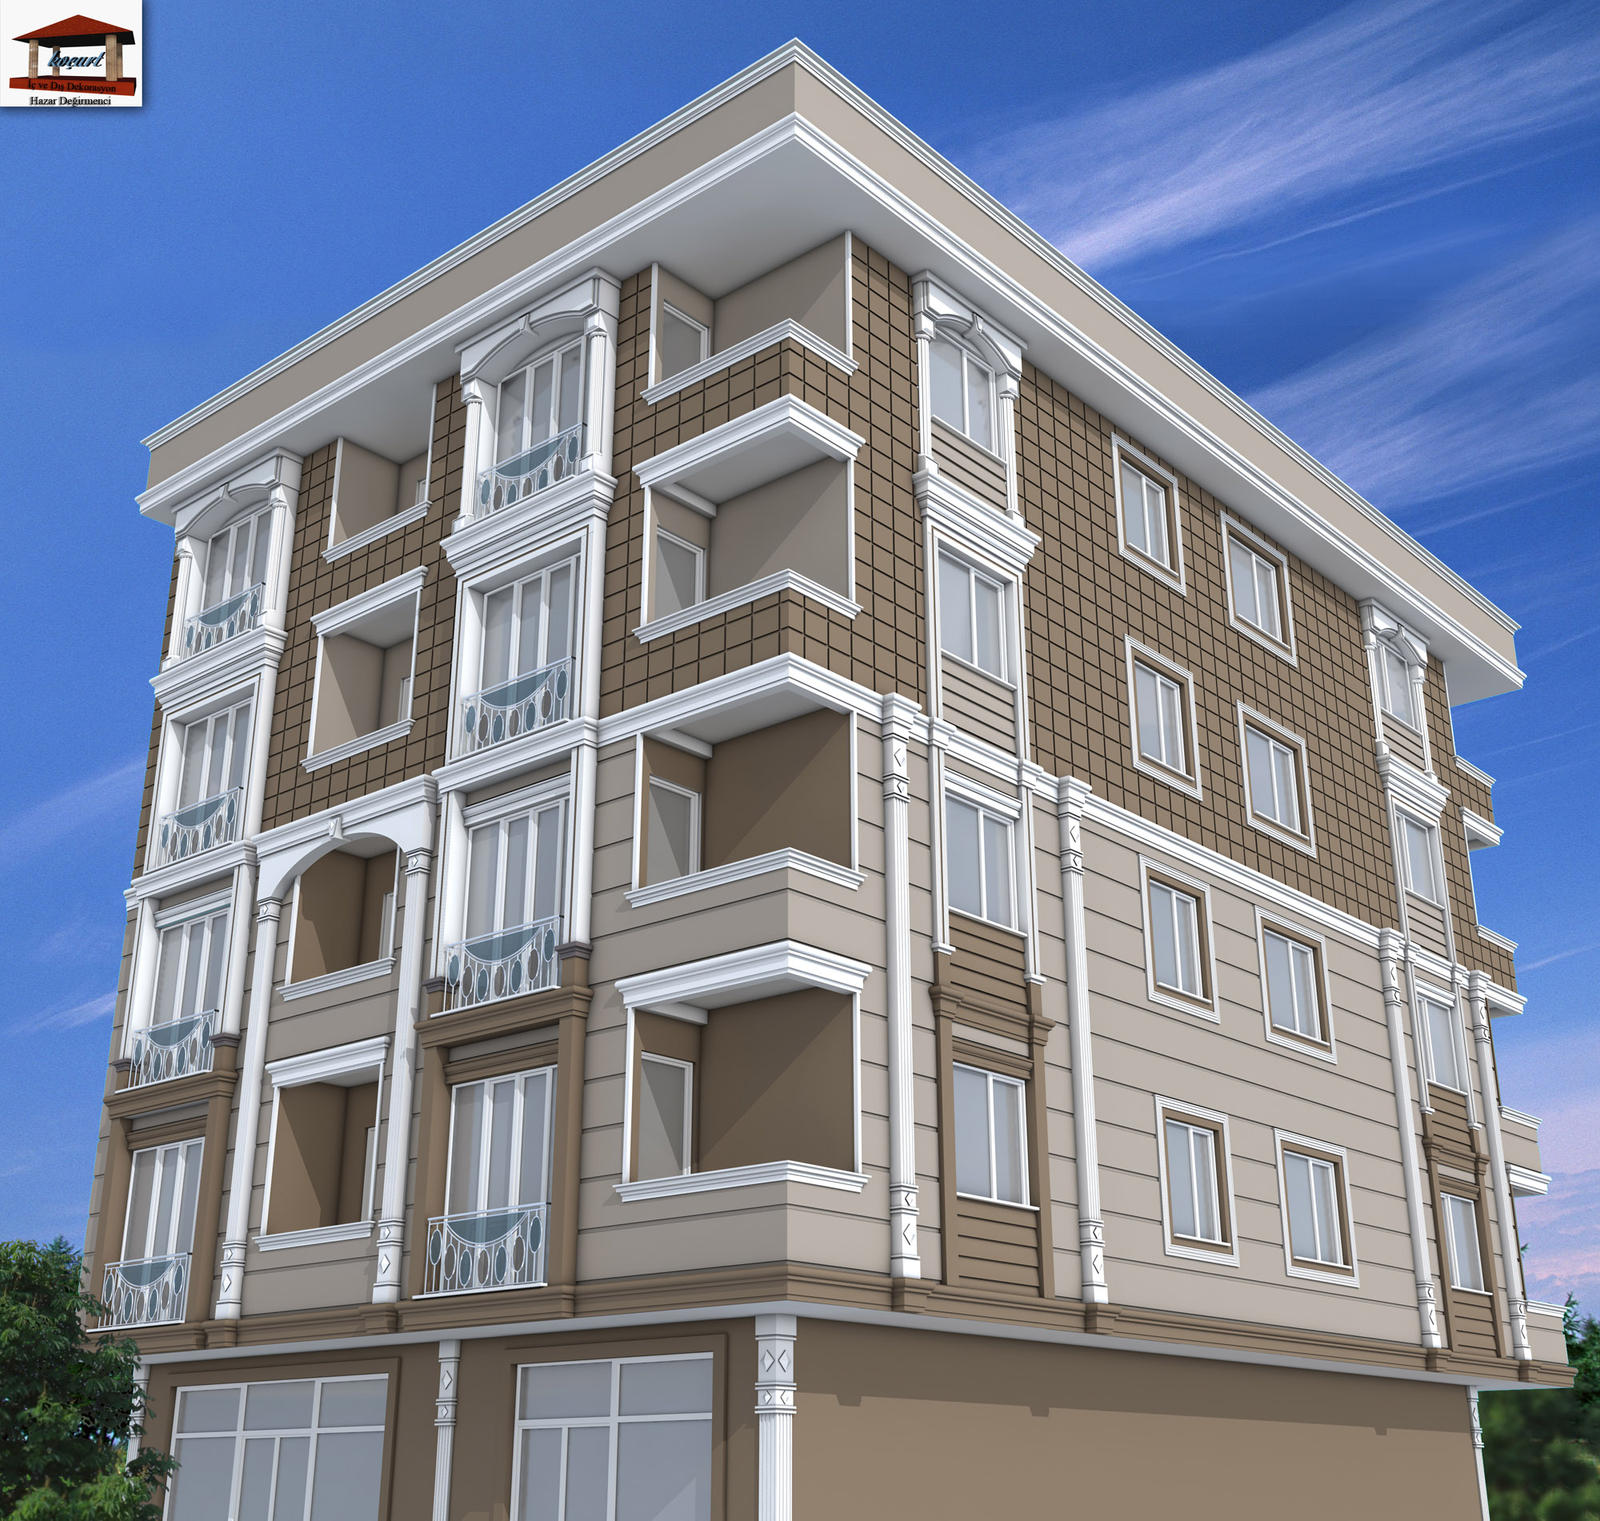 building design 01 01 by feanorrauko on deviantart. Black Bedroom Furniture Sets. Home Design Ideas